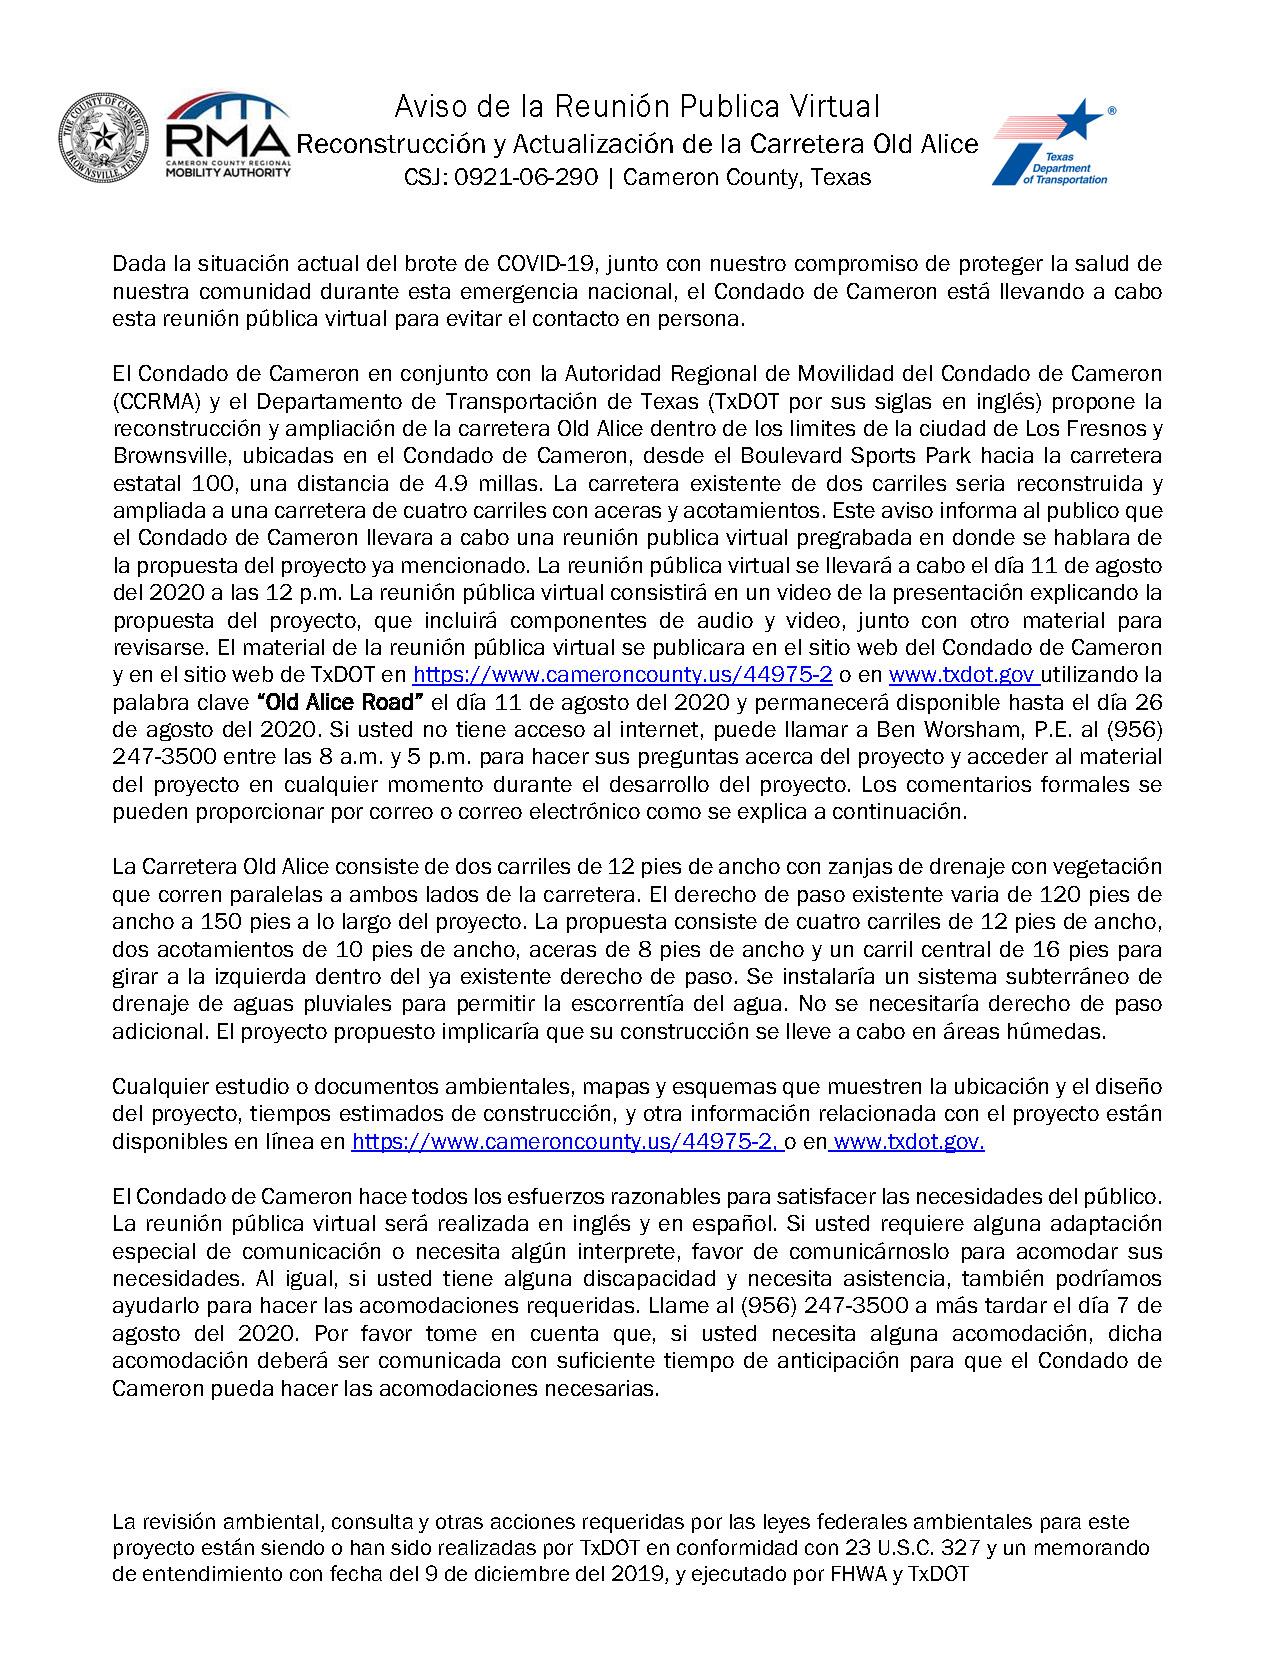 Aviso De Reunión Pública Virtual Page 1